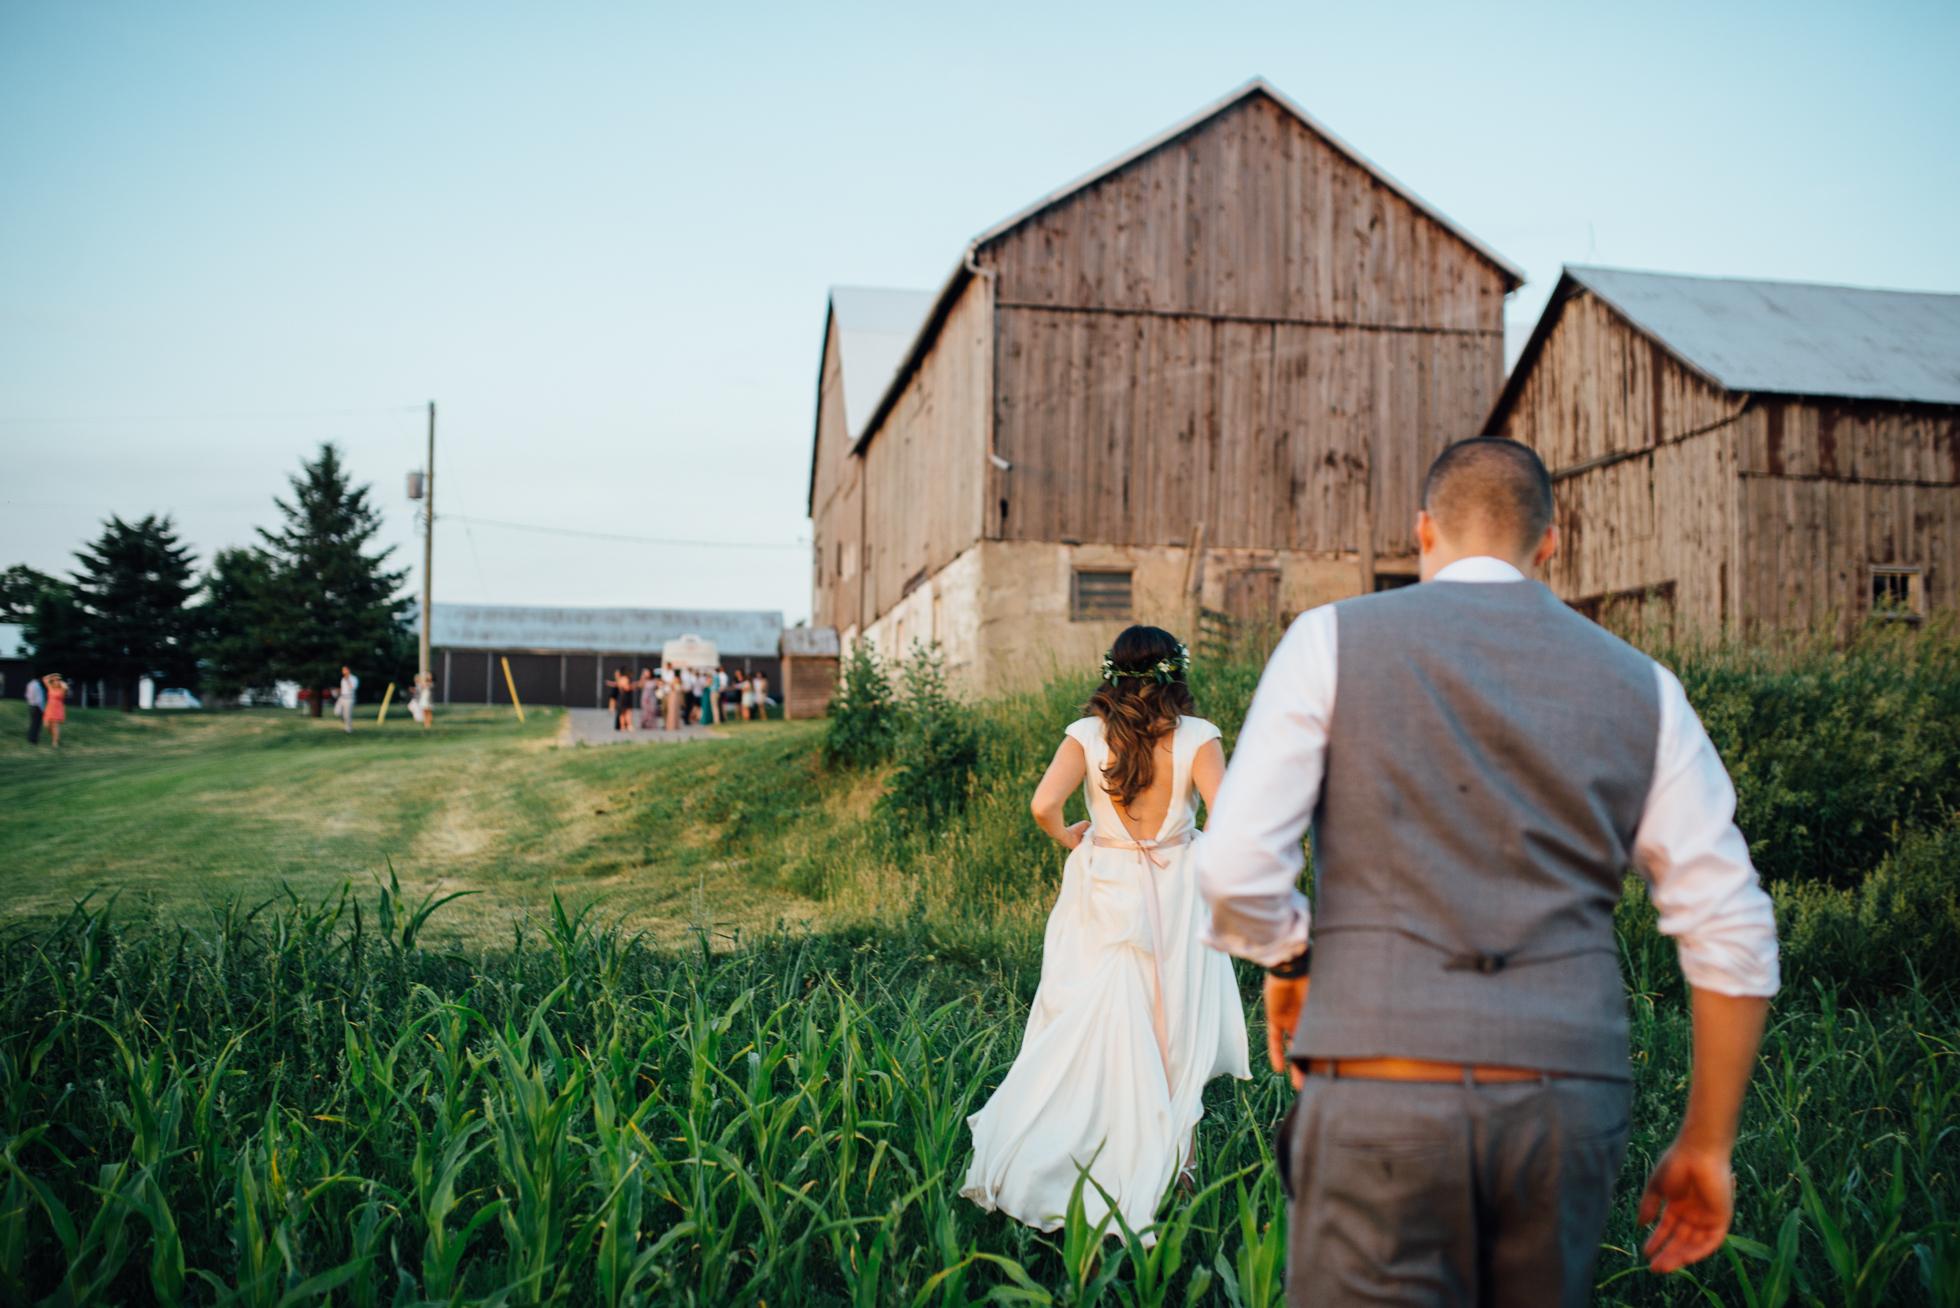 Downswell-Barn-Wedding-Photography-108.jpg